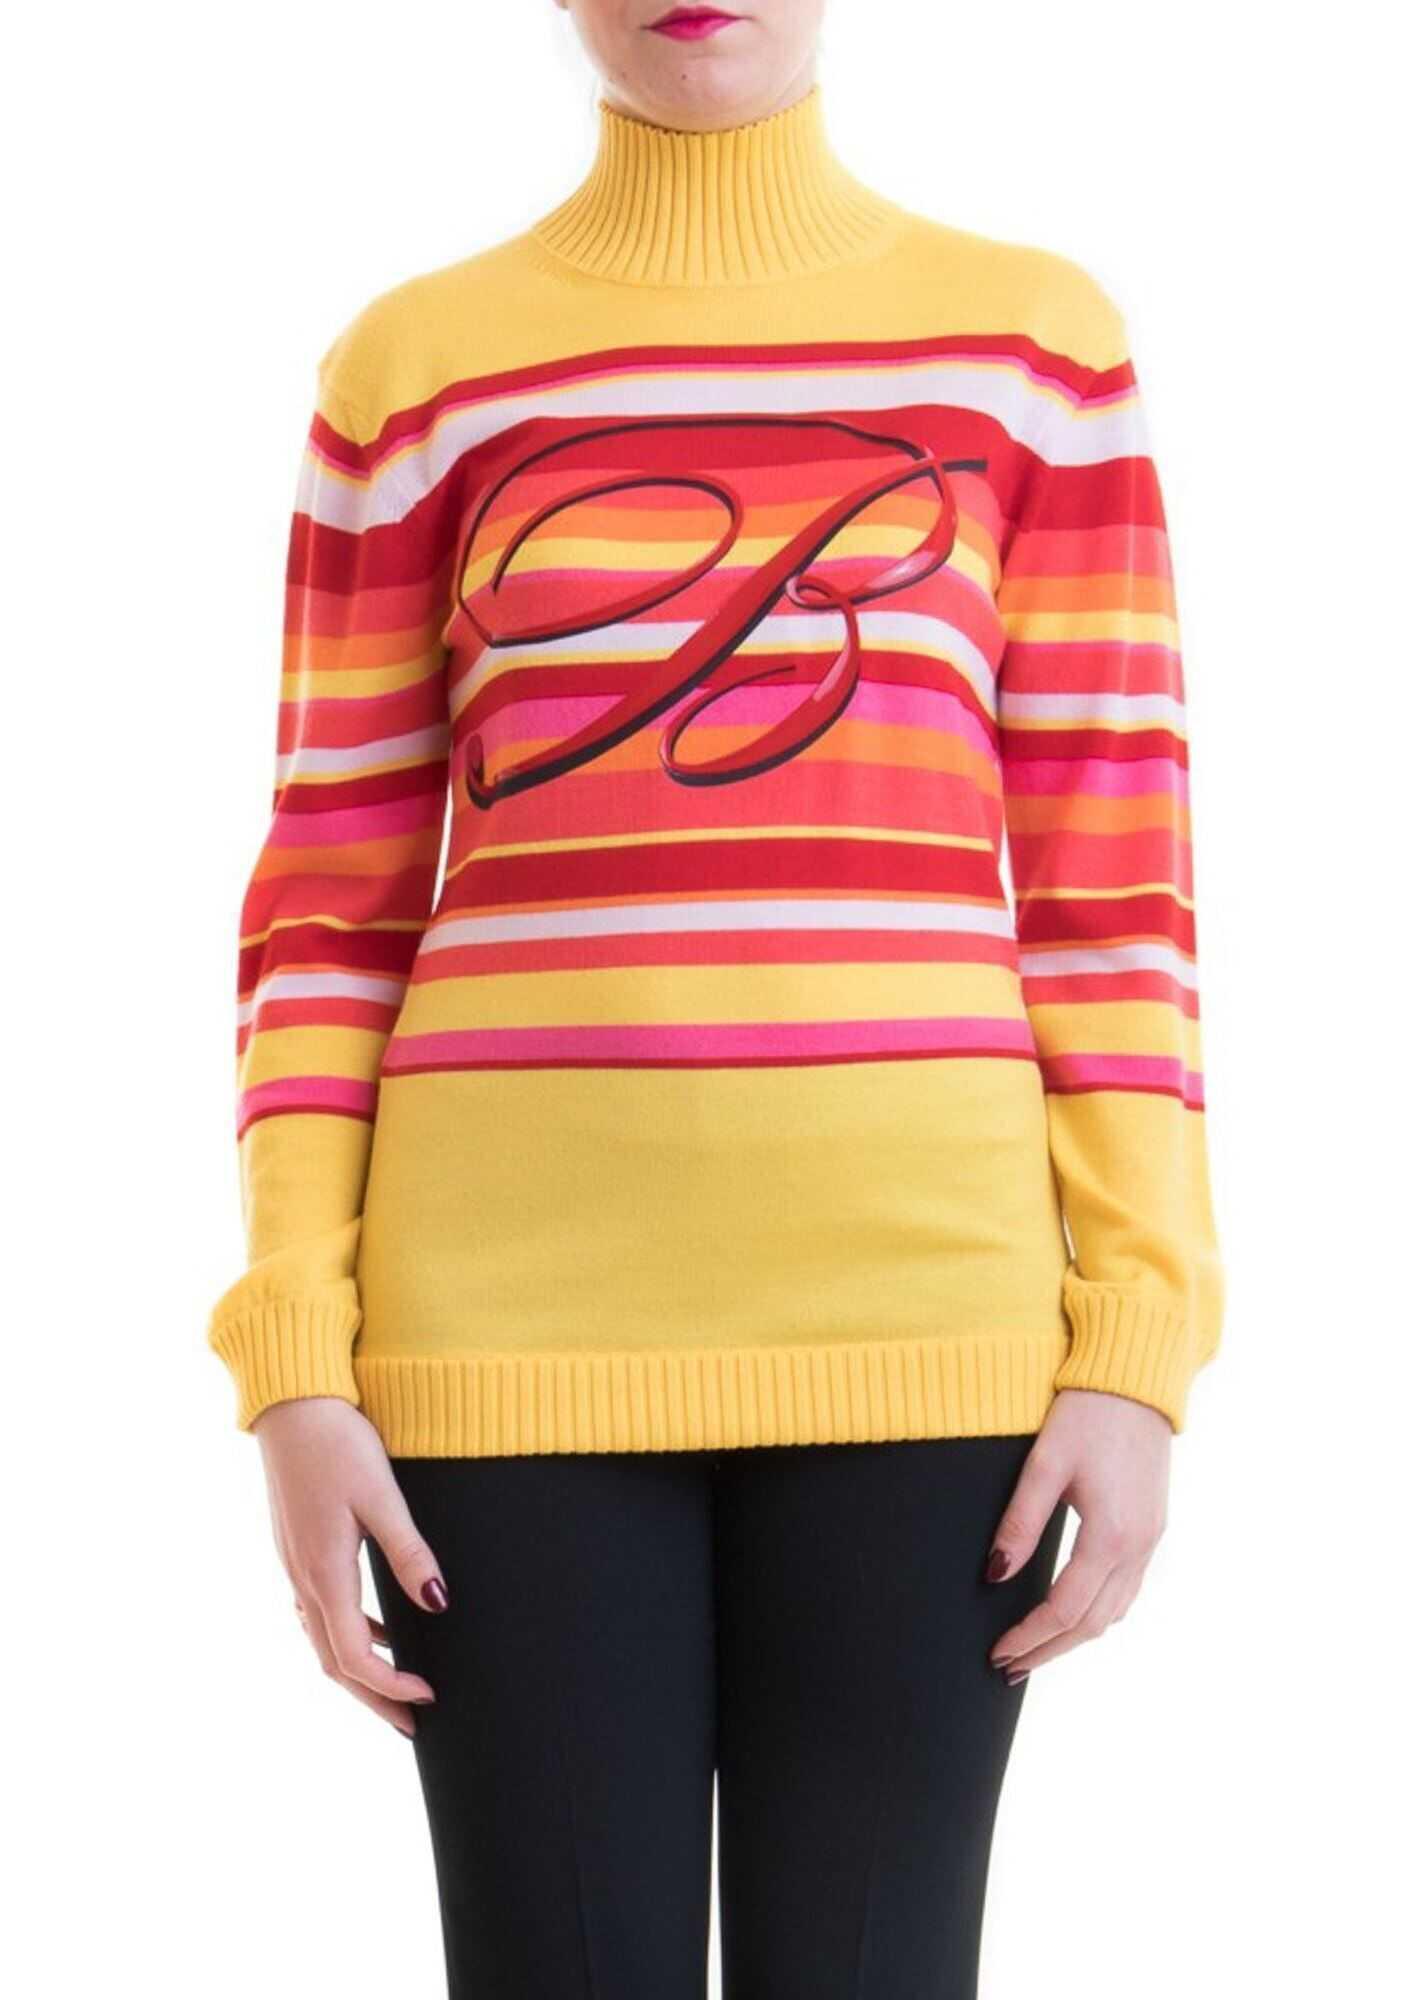 Blumarine Striped Wool Sweater Multi